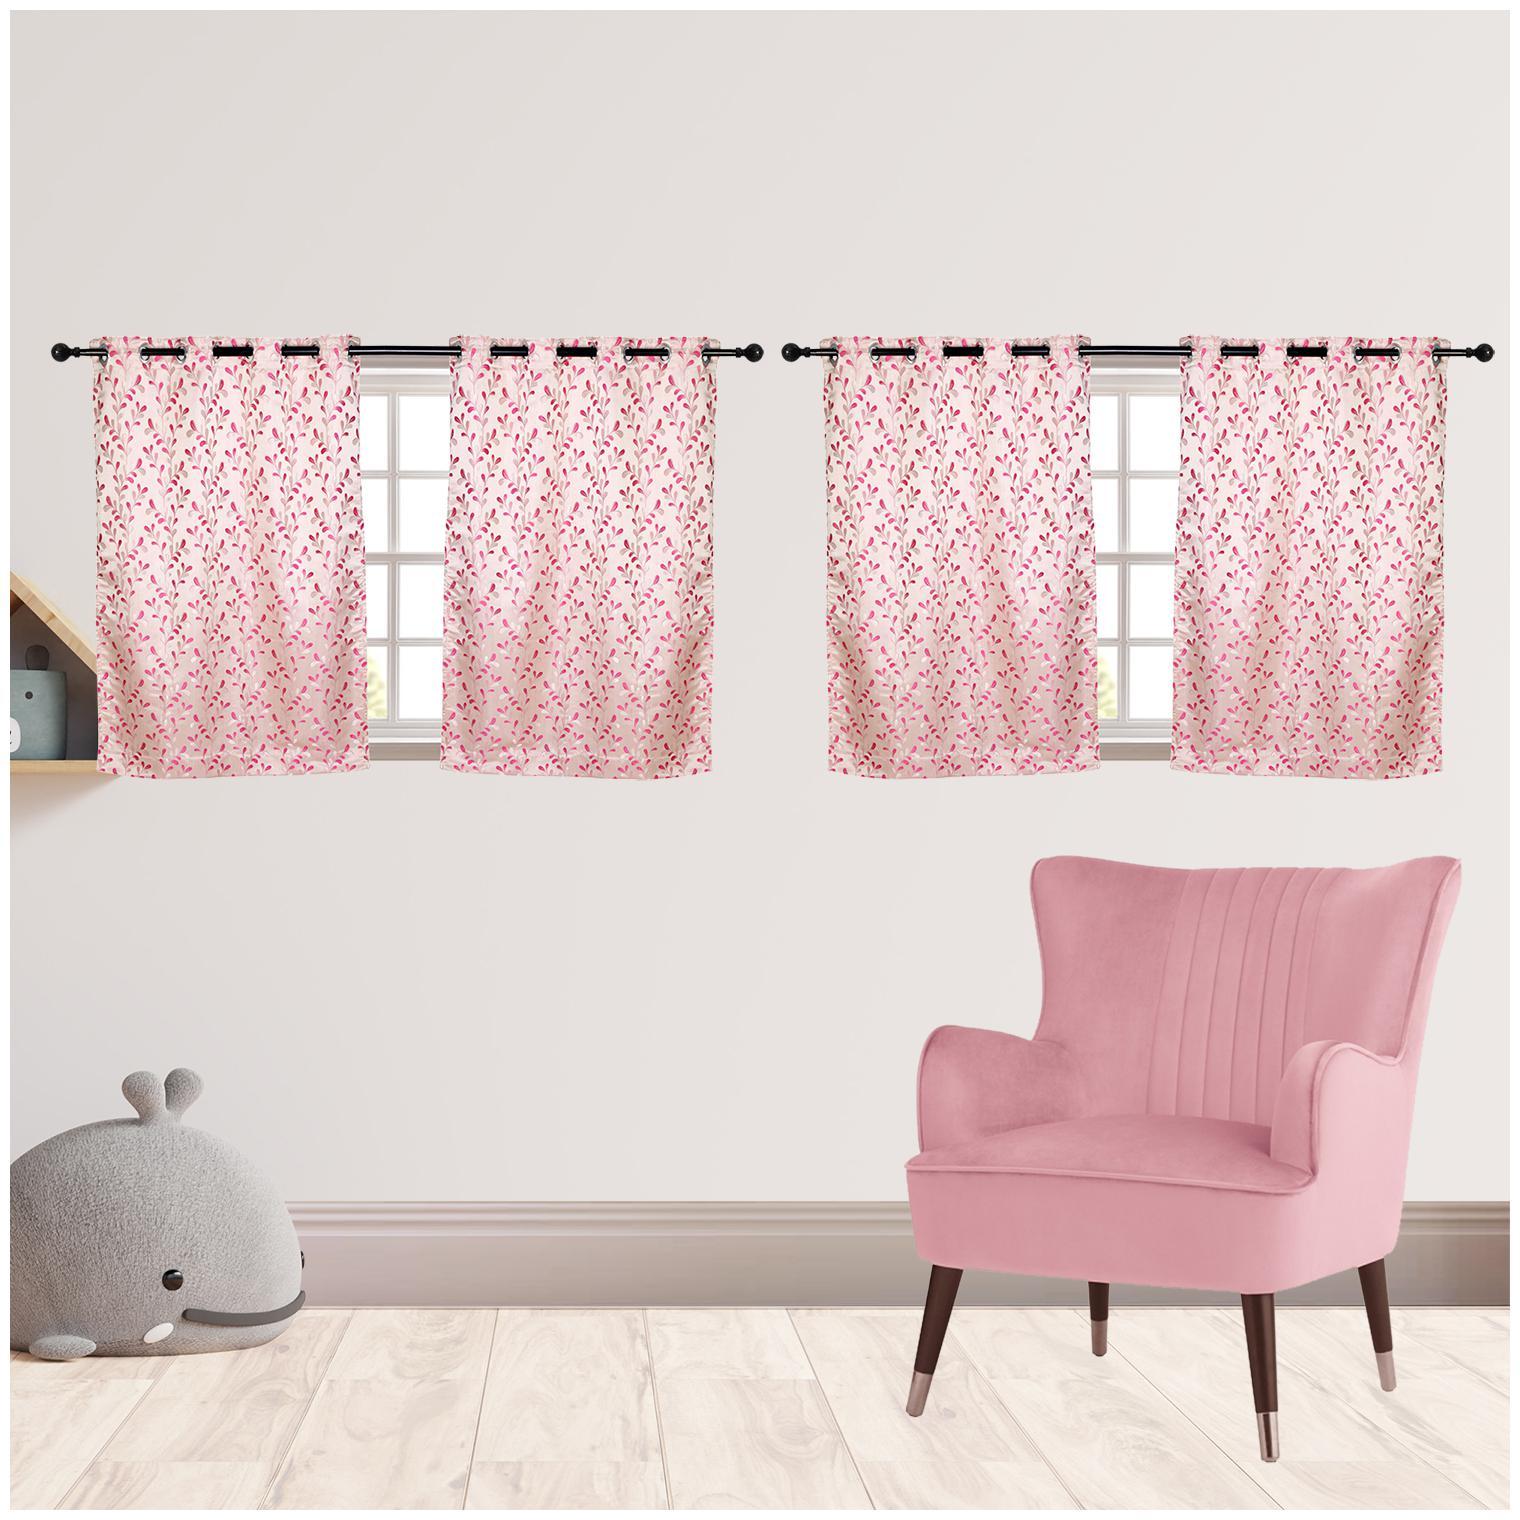 R S Furnishing Polyester Window Semi Transparent Pink Regular Curtain ( Eyelet...